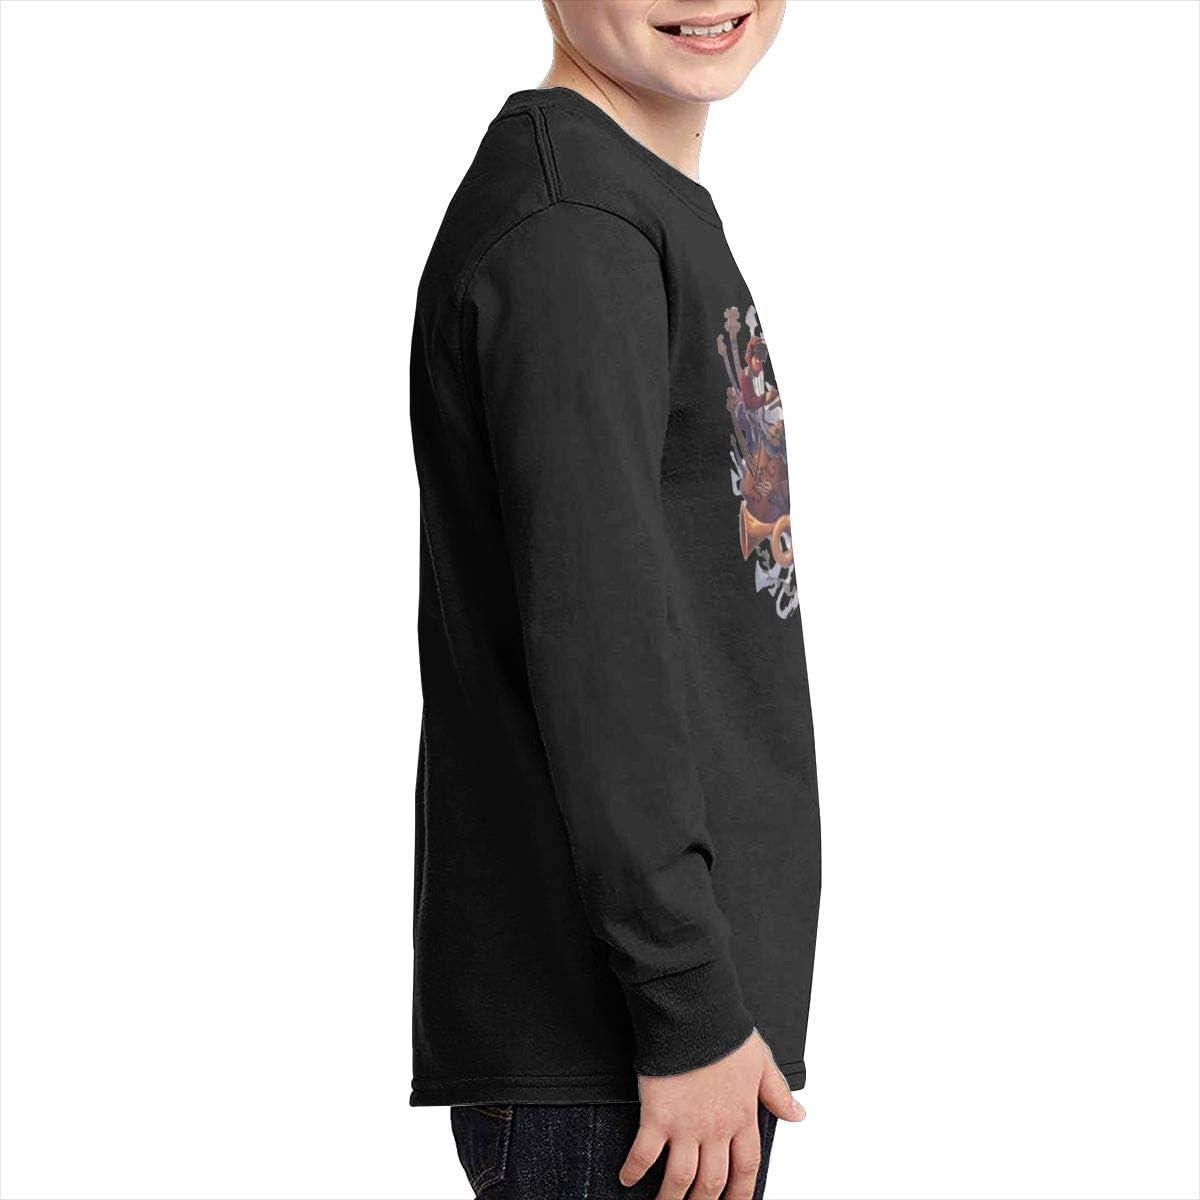 AJR What Everyons Thinking Cotton Youth Girls Boys Long Sleeve Tee Shirt Black M